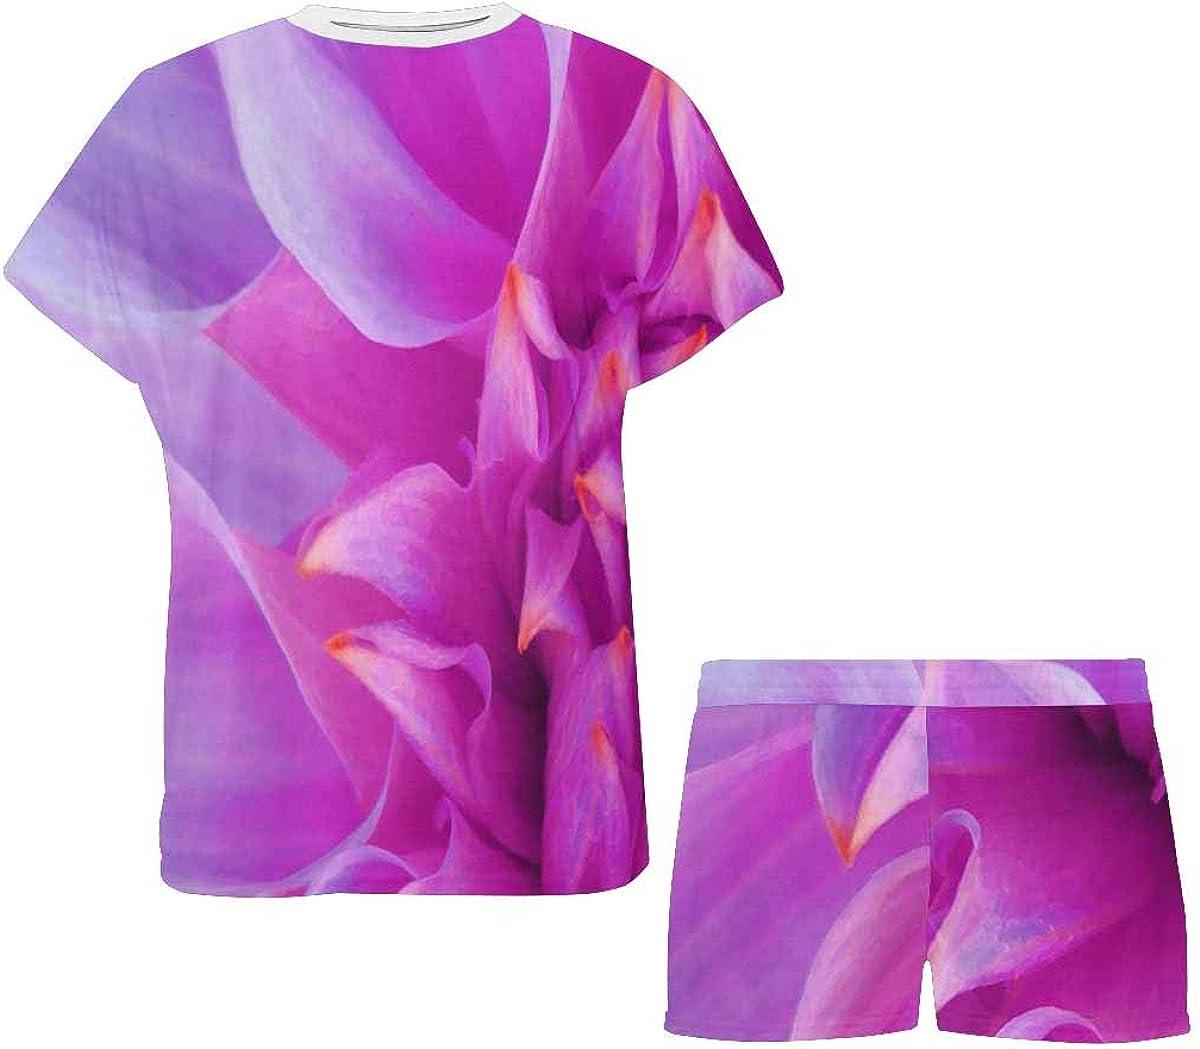 InterestPrint Bright Pink Dahlia Flower Women's Breathable 2 Piece Shorts Pajama Sleepwear Set